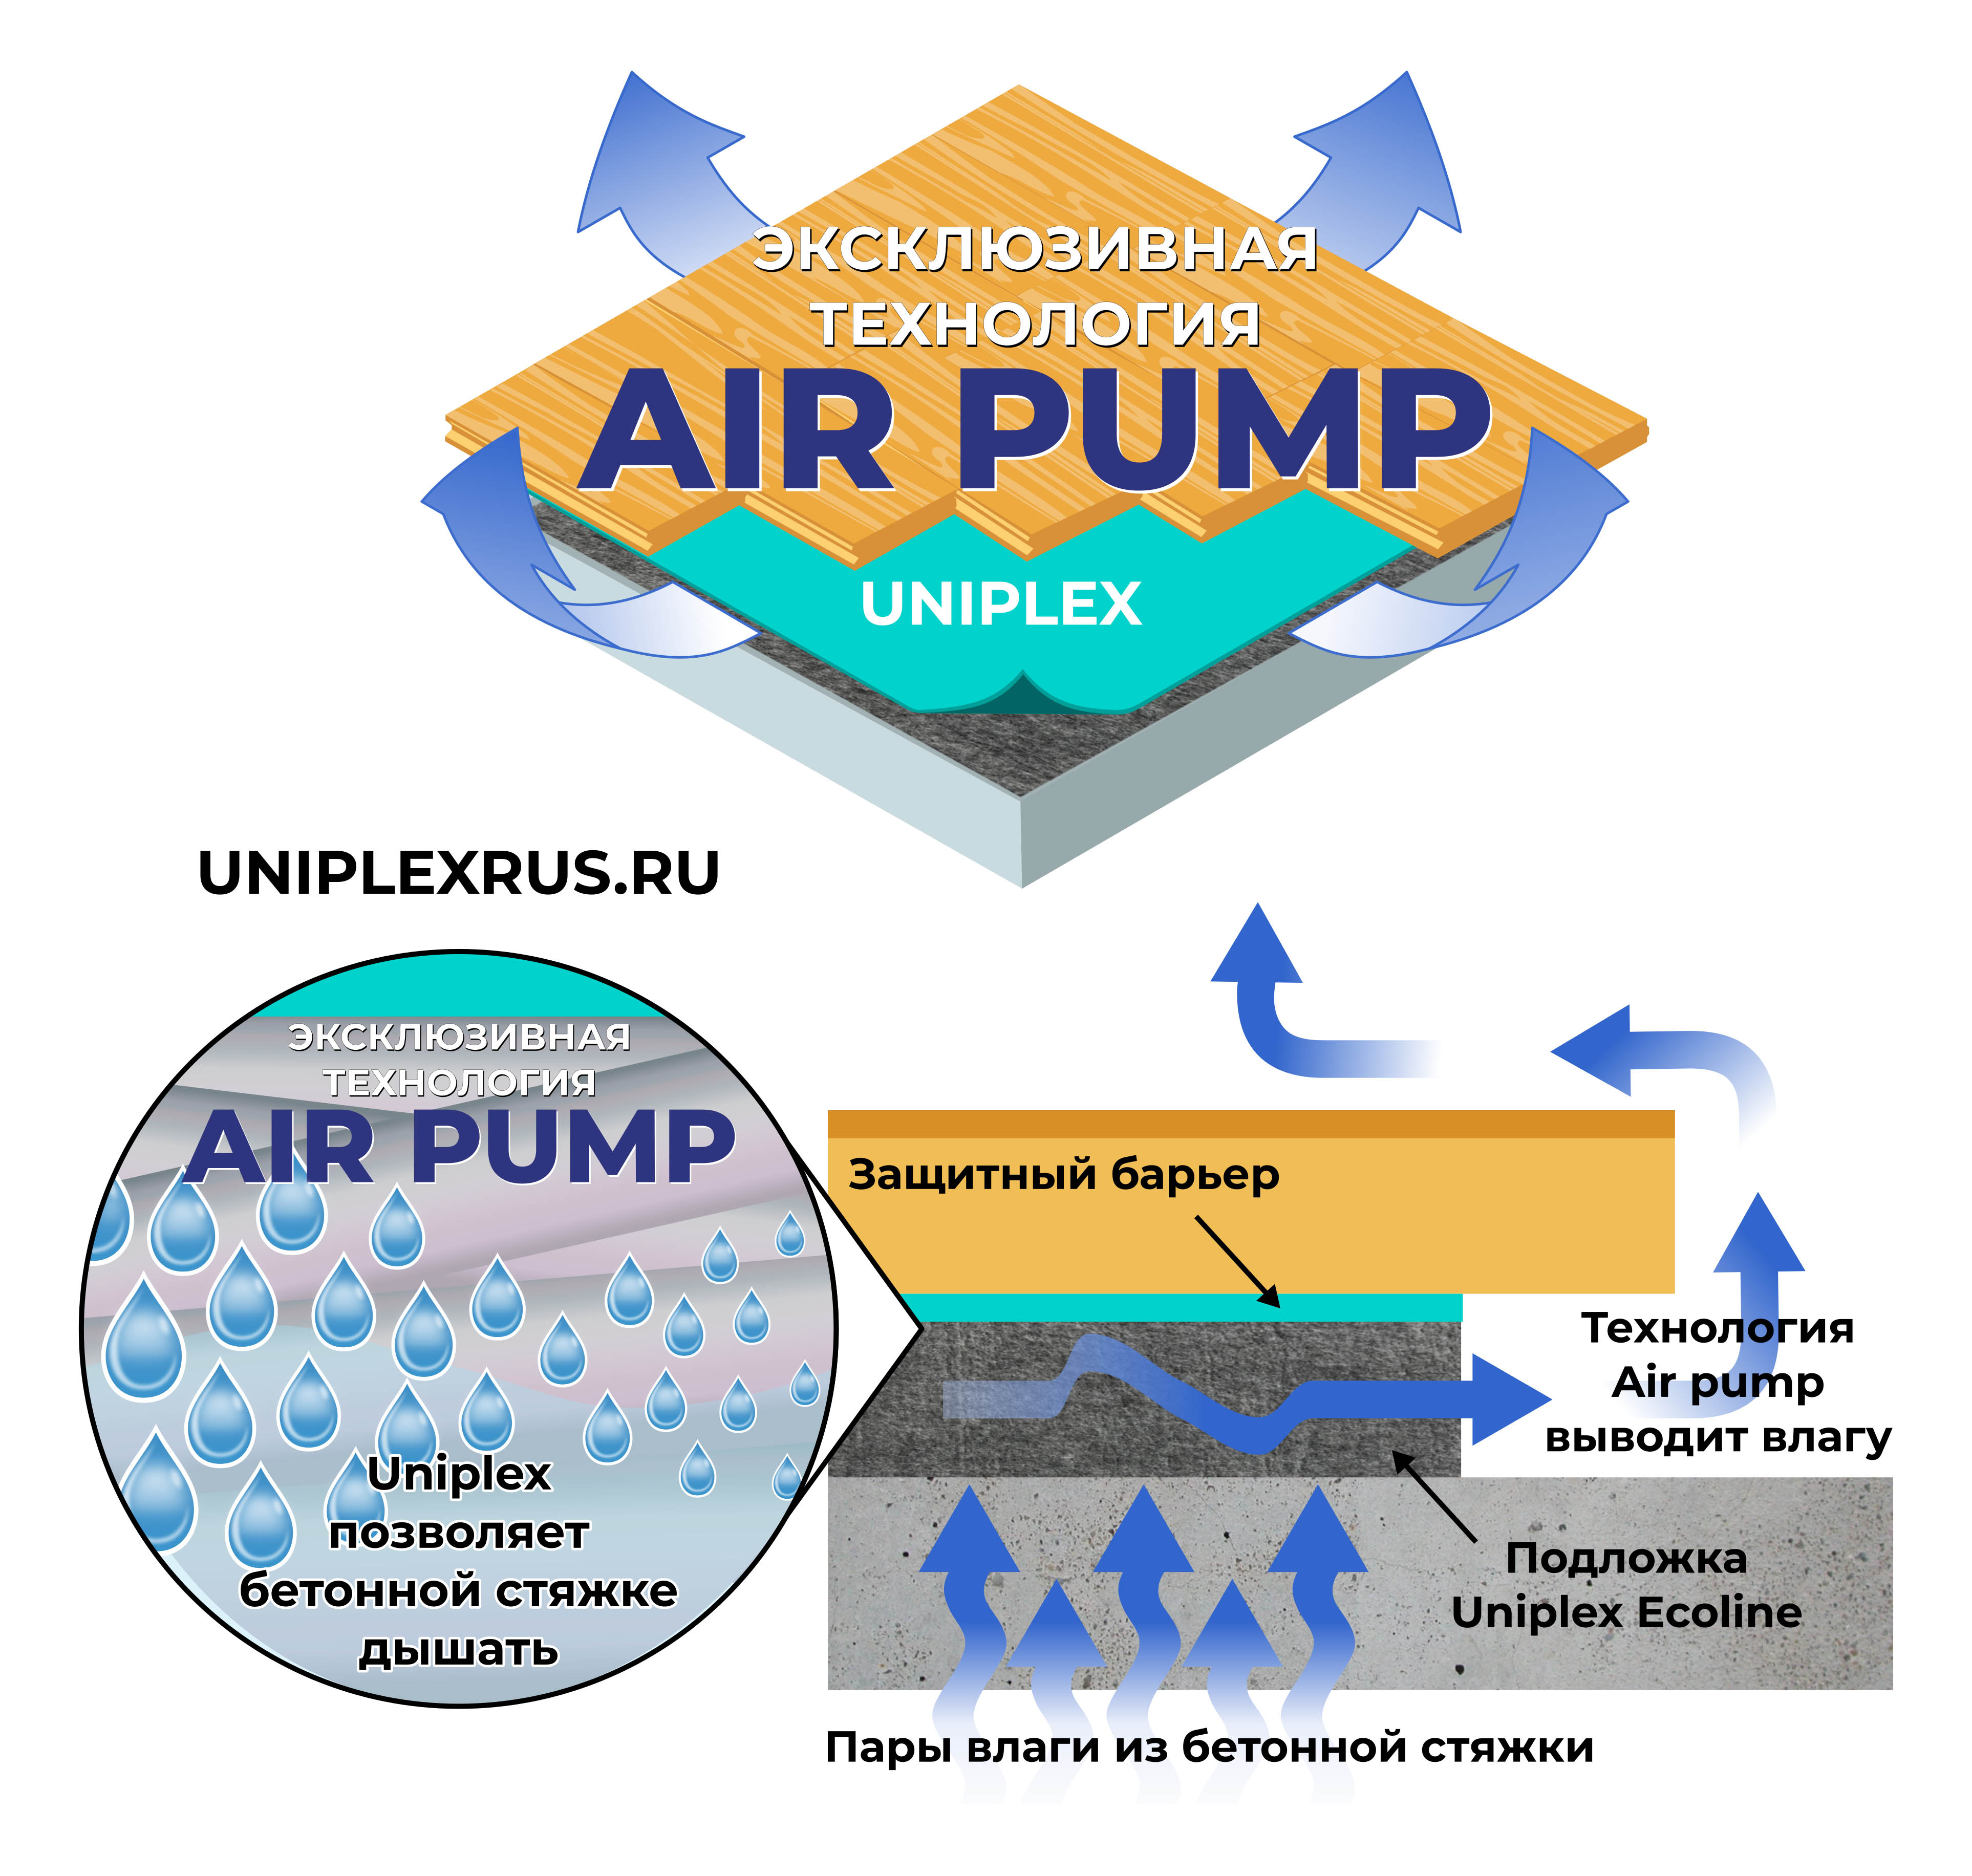 подложка UNIPLEX air pump